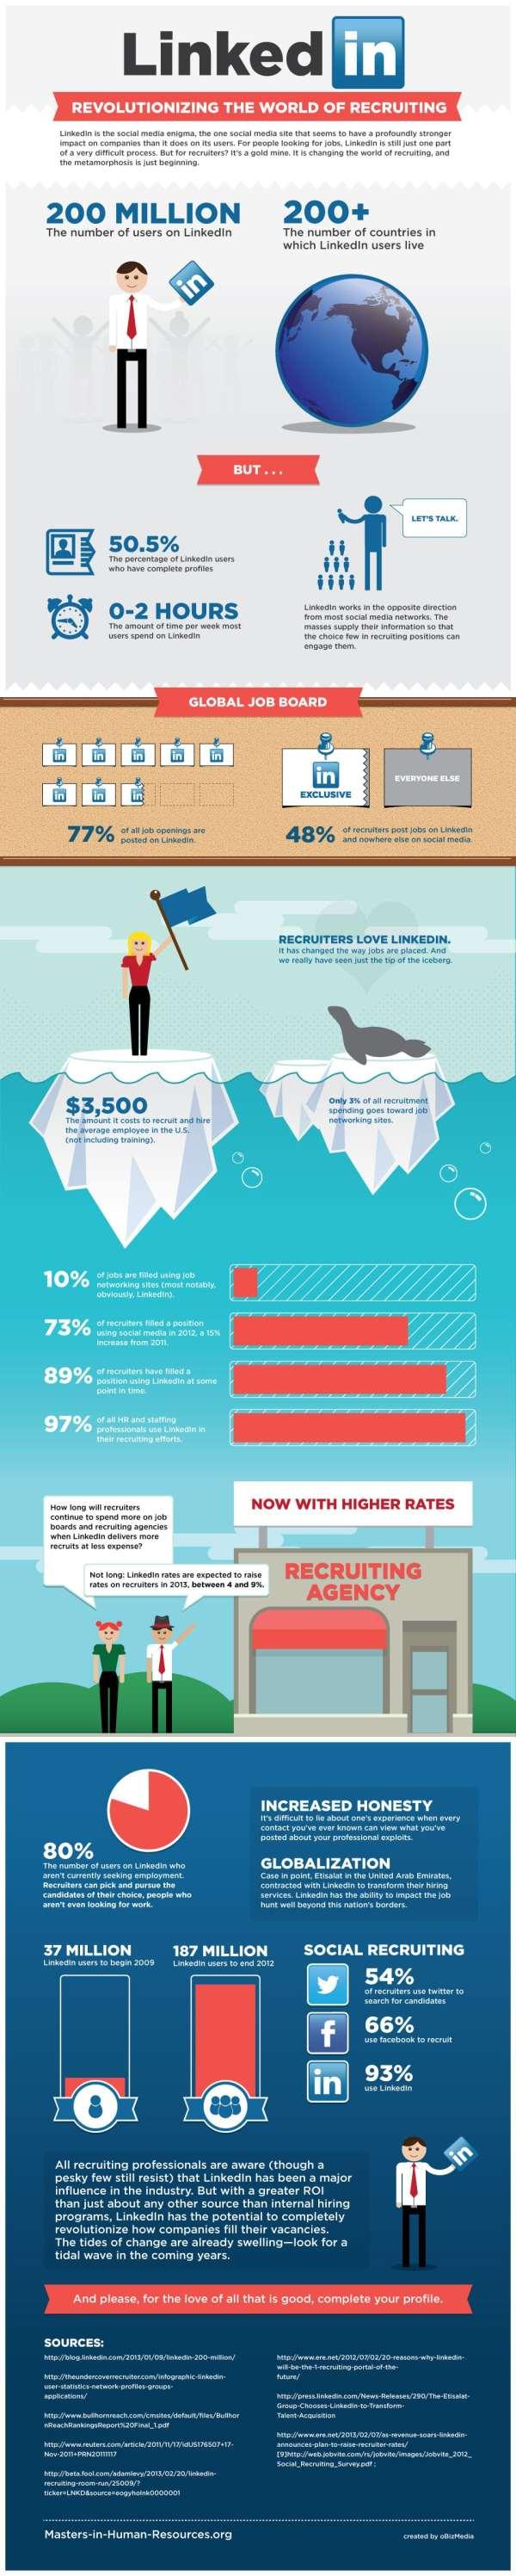 LinkedIn Recruitment Infographic